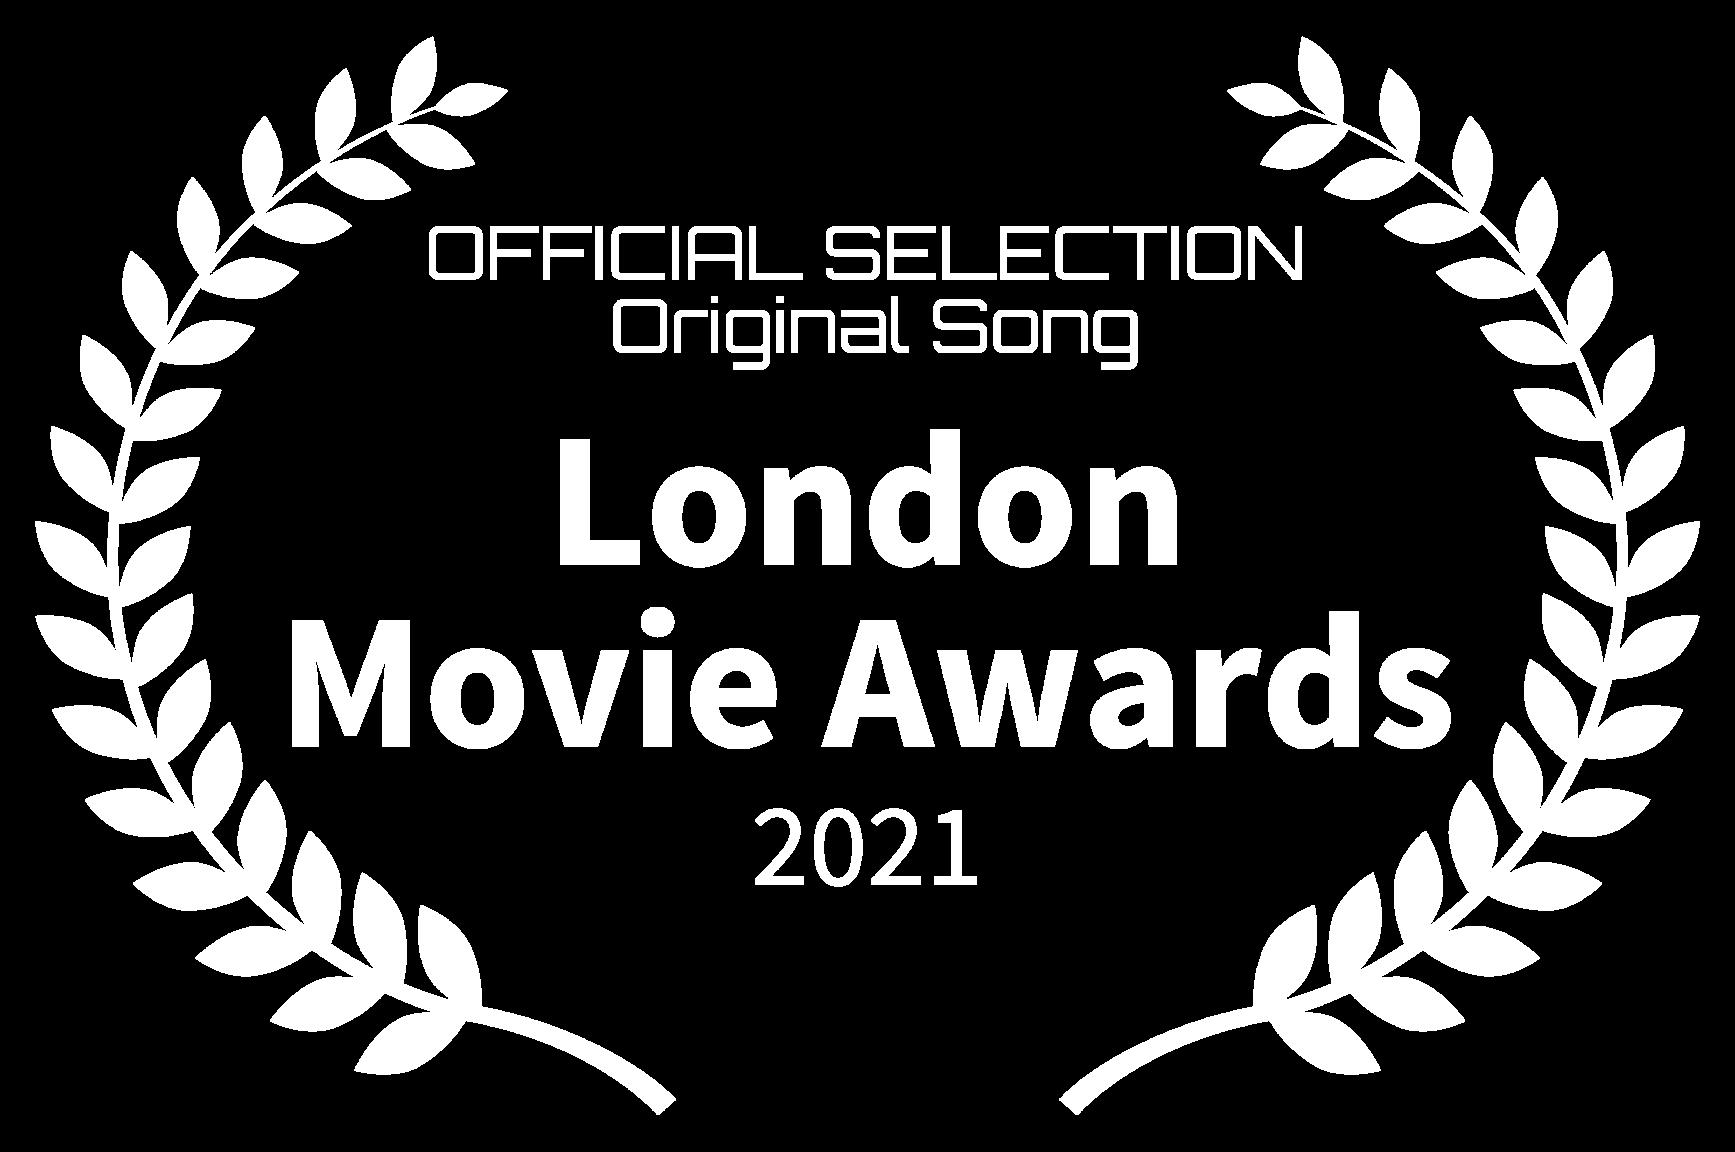 OFFICIAL SELECTION Original Song - London Movie Awards - 2021